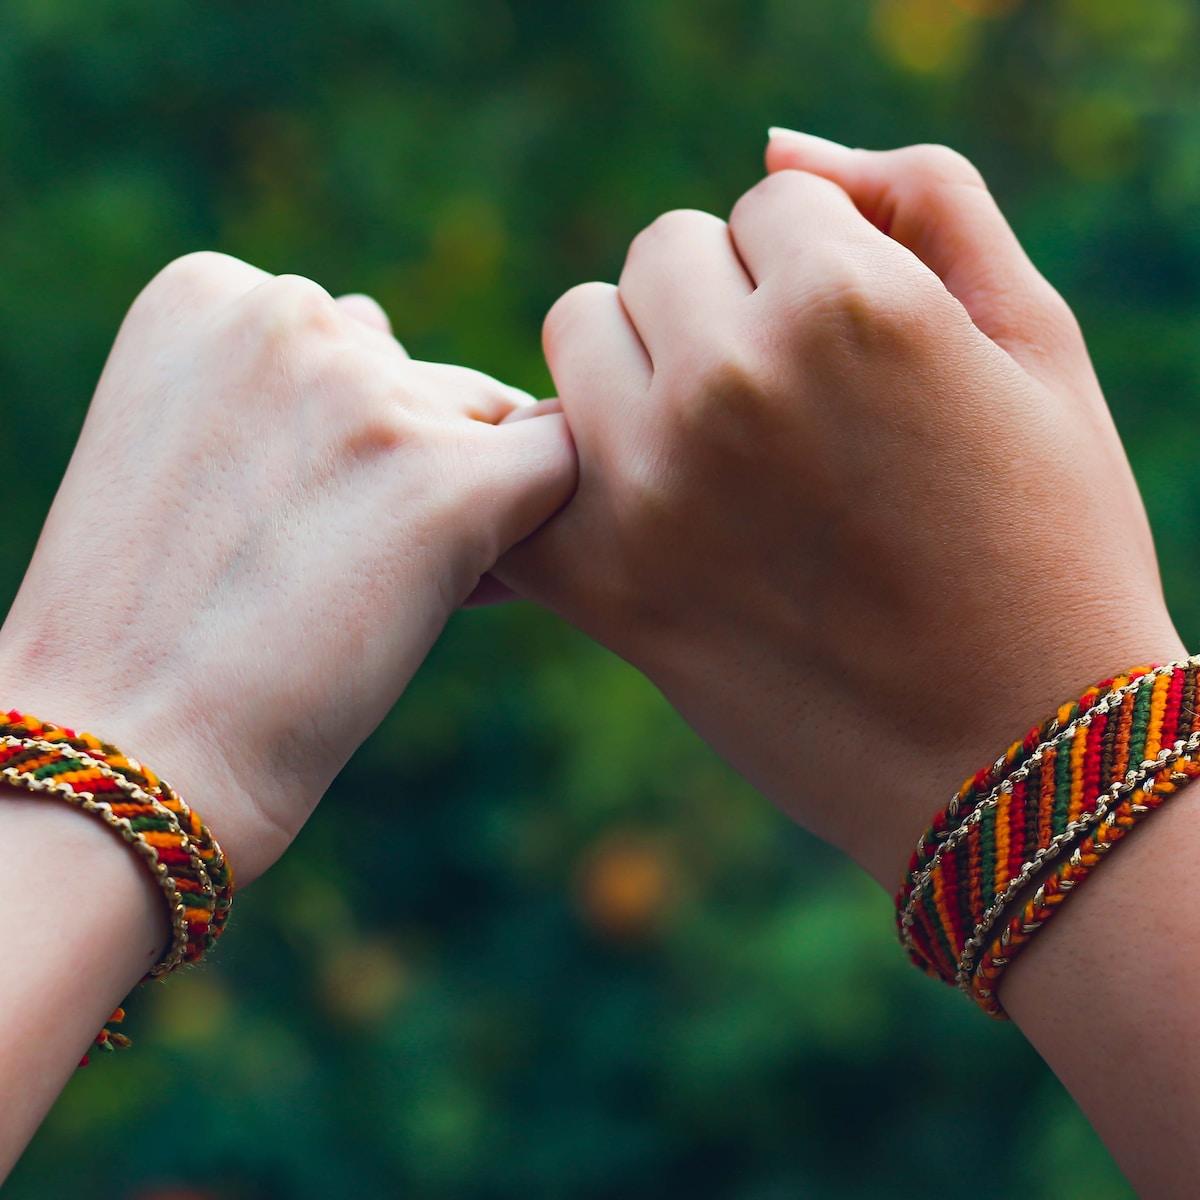 pulseras para los mareos, person wearing beaded bracelets and bracelet